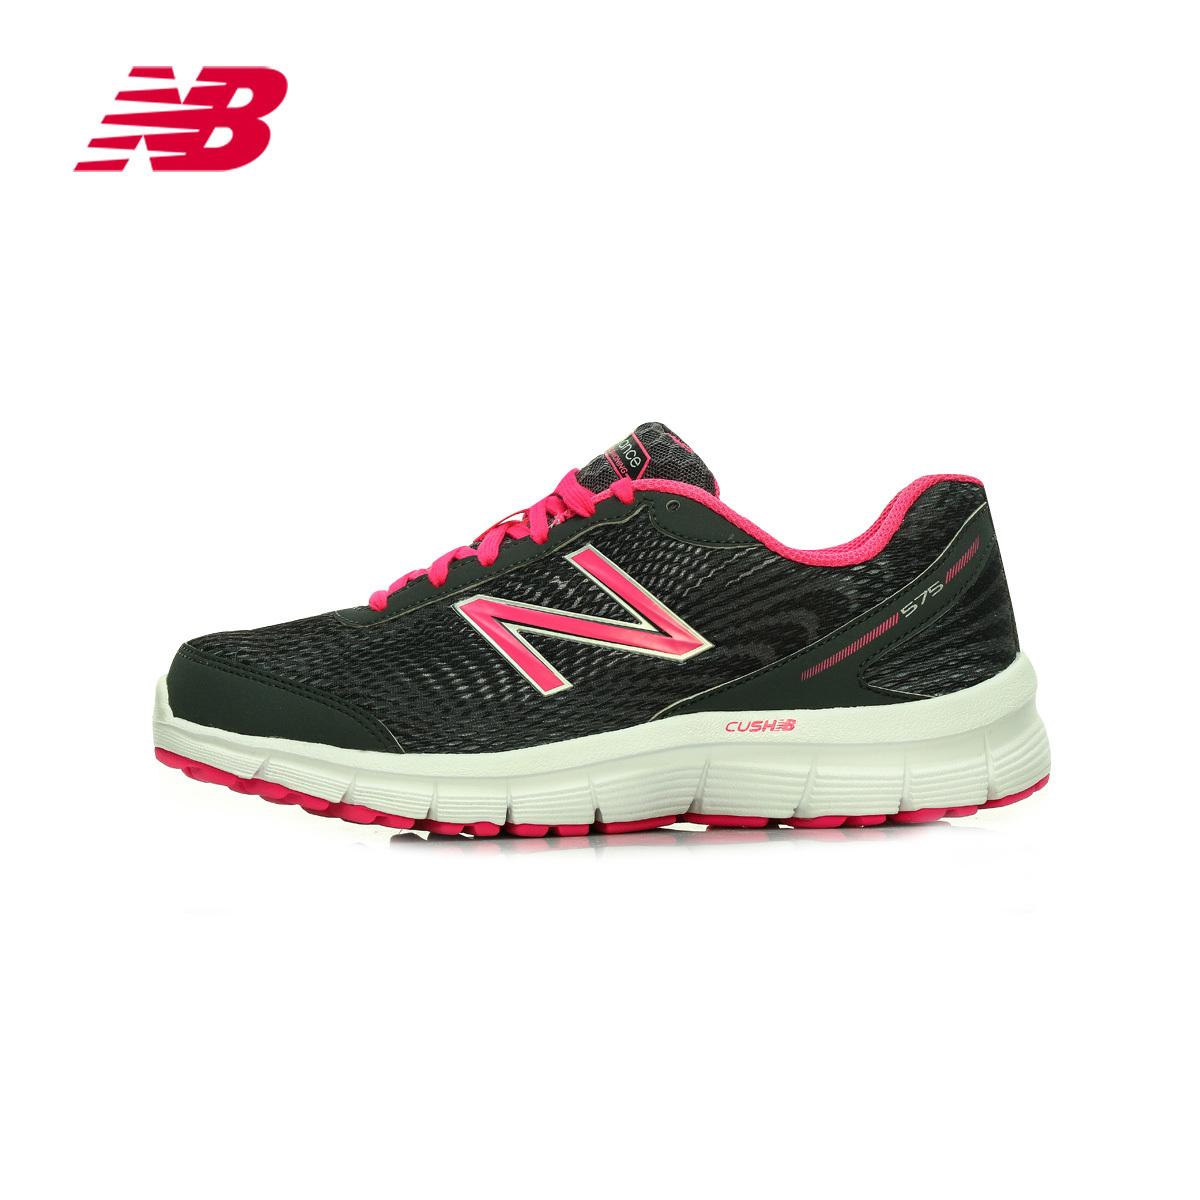 New Balance/NB 575系列女鞋专业跑步鞋运动鞋休闲鞋W575GP1